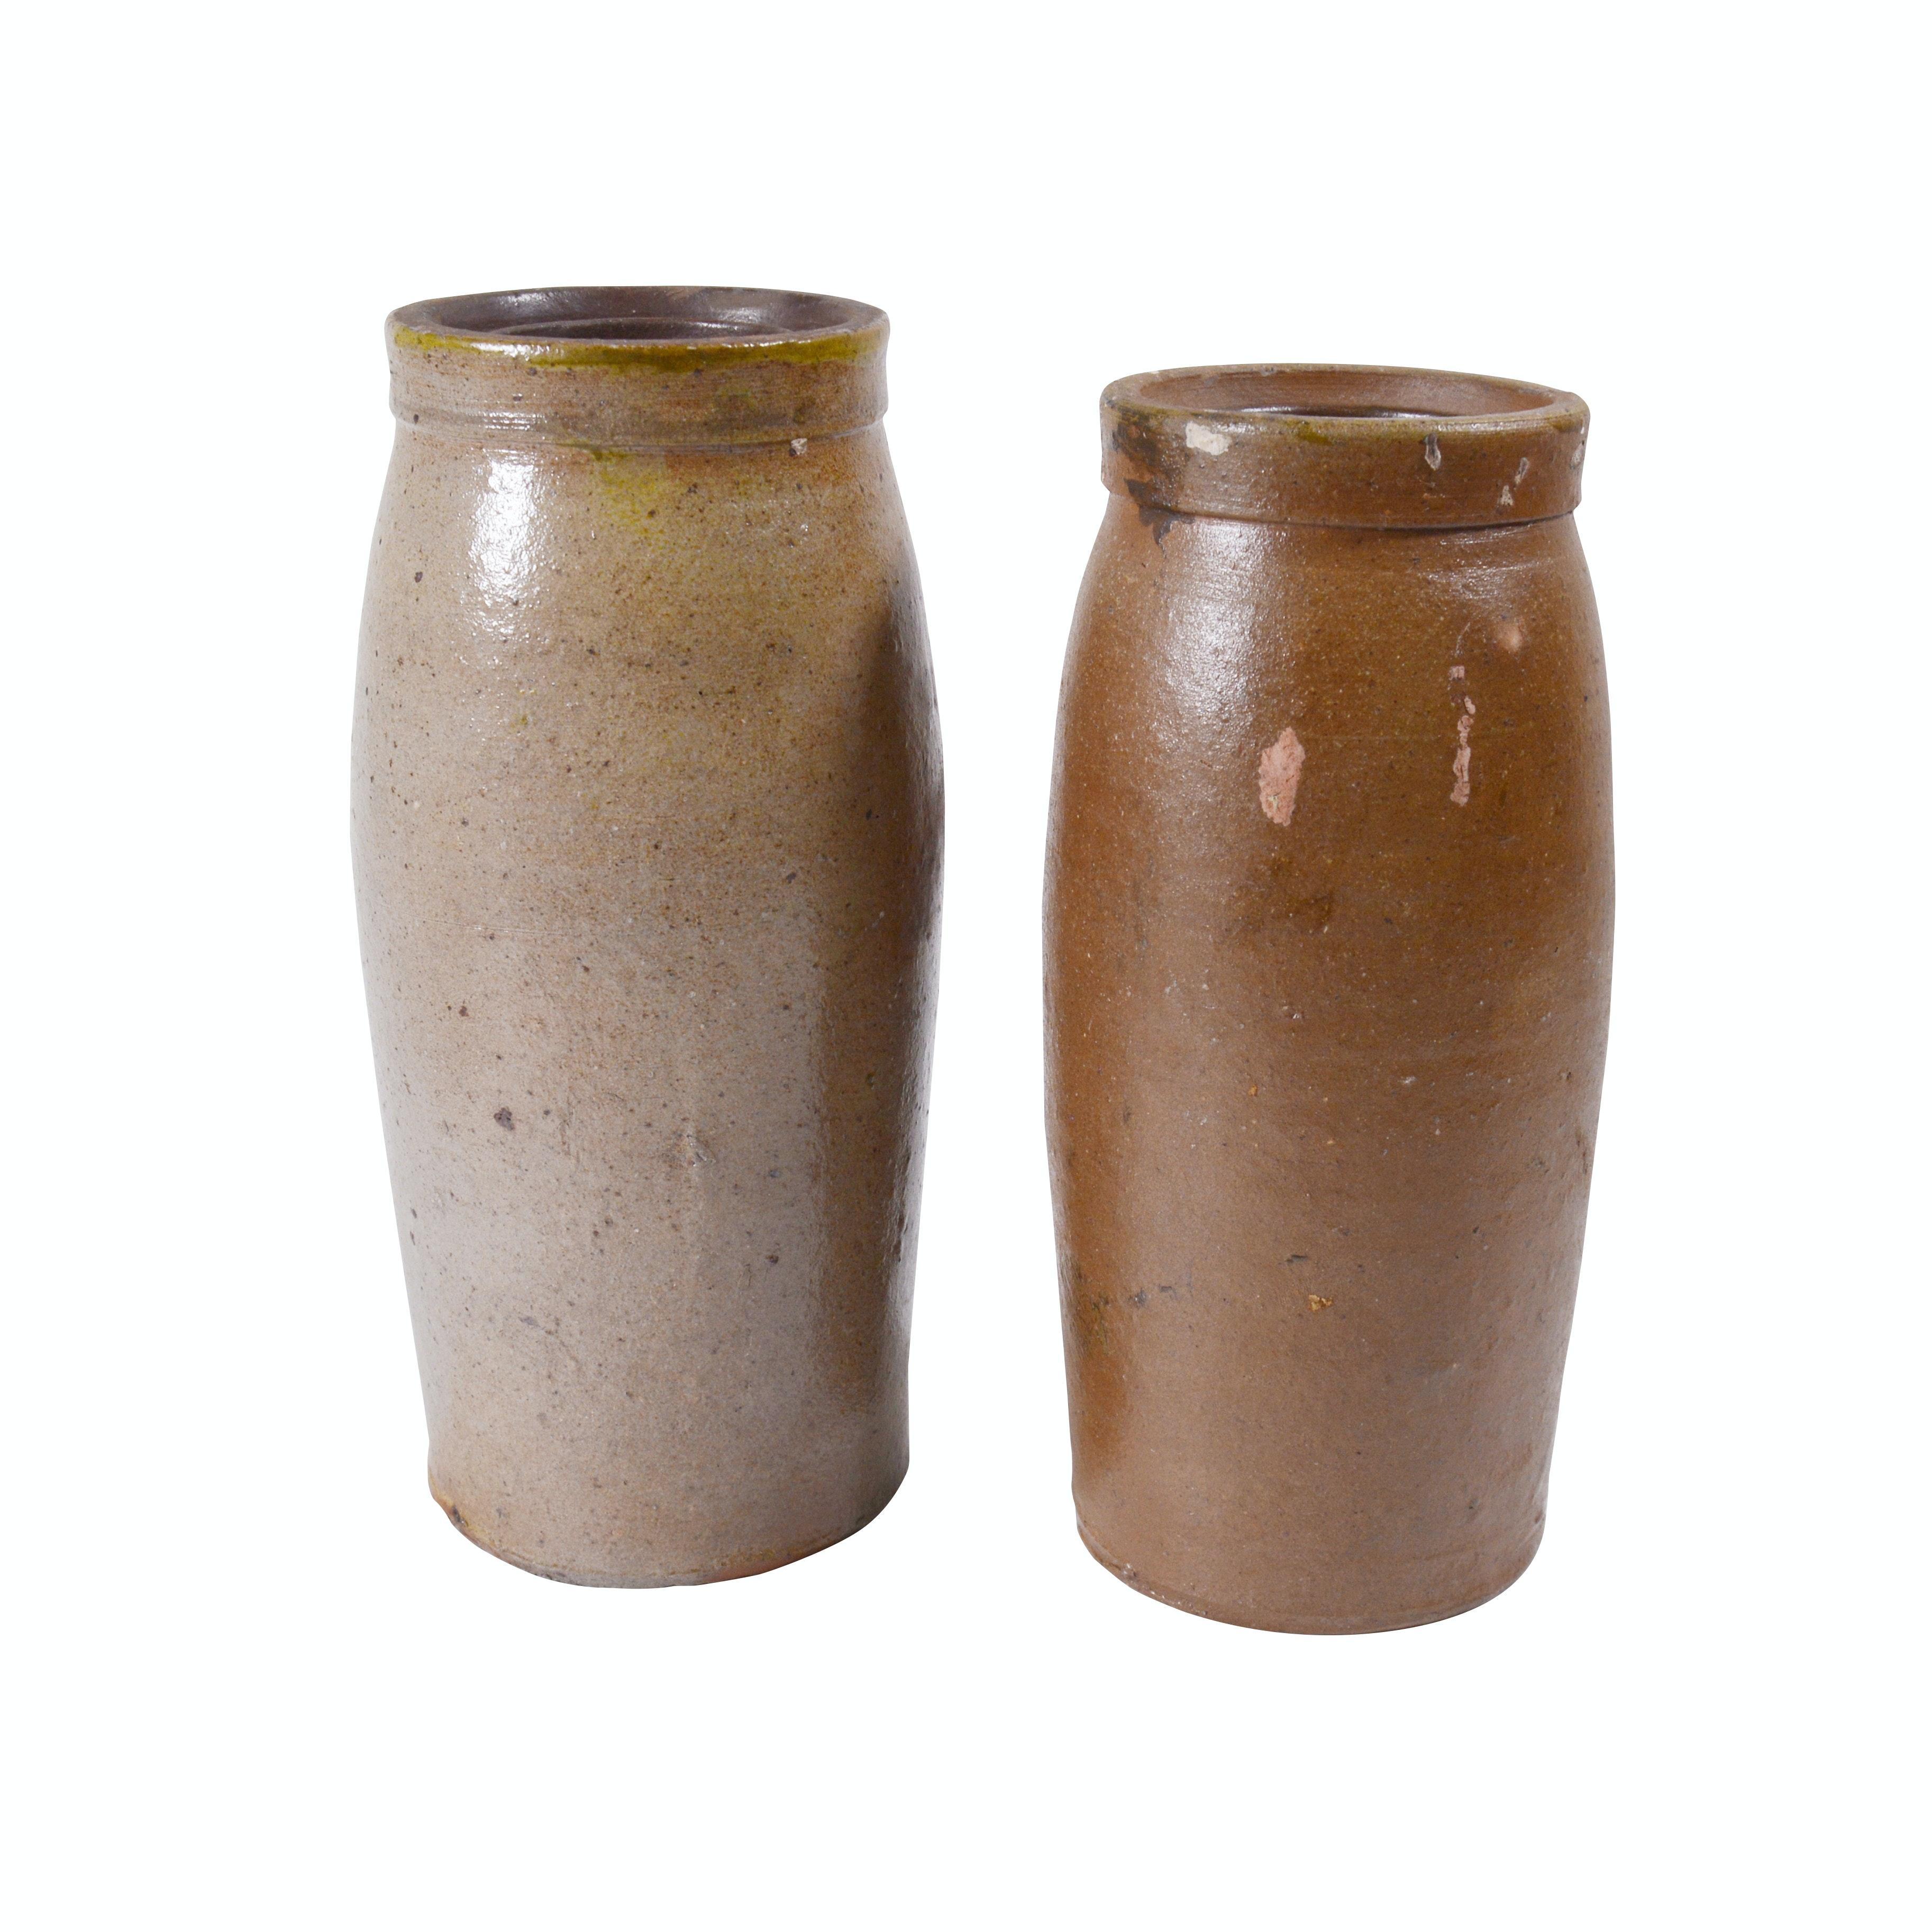 Salt Glazed Stoneware Fermentation Jars, Vintage